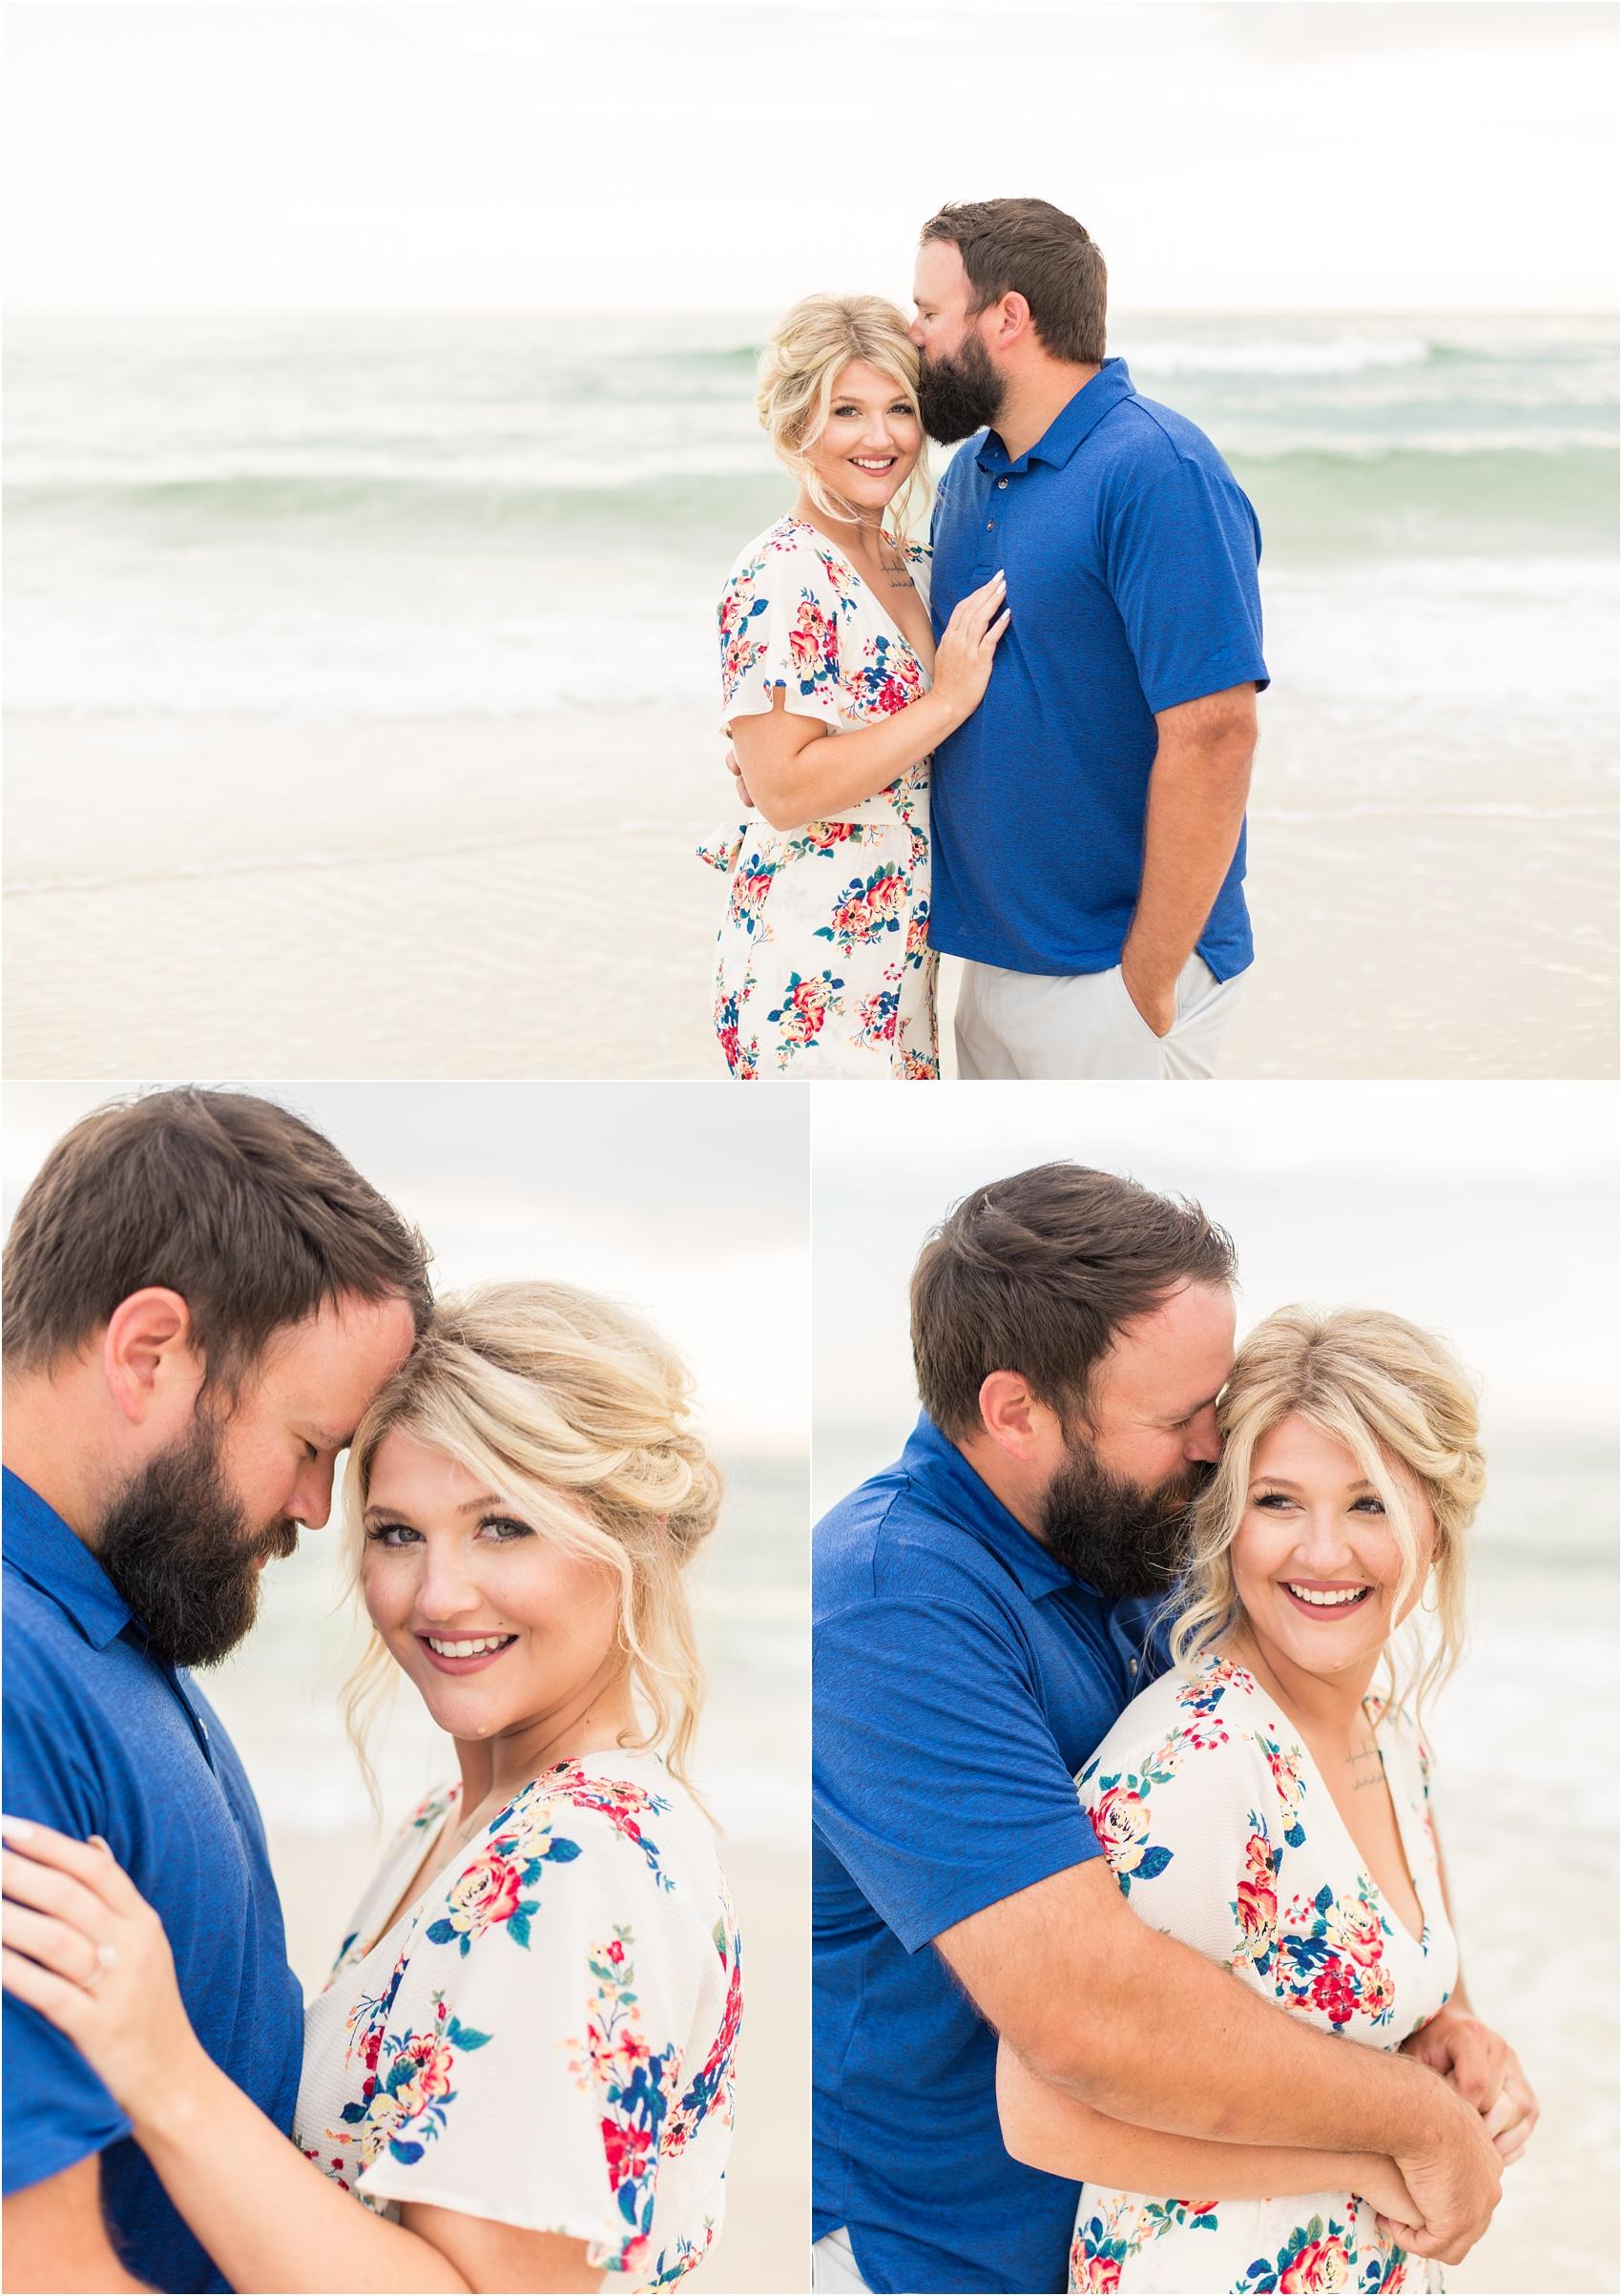 Savannah Eve Photography- Madison & Tim's Engagements-2.jpg